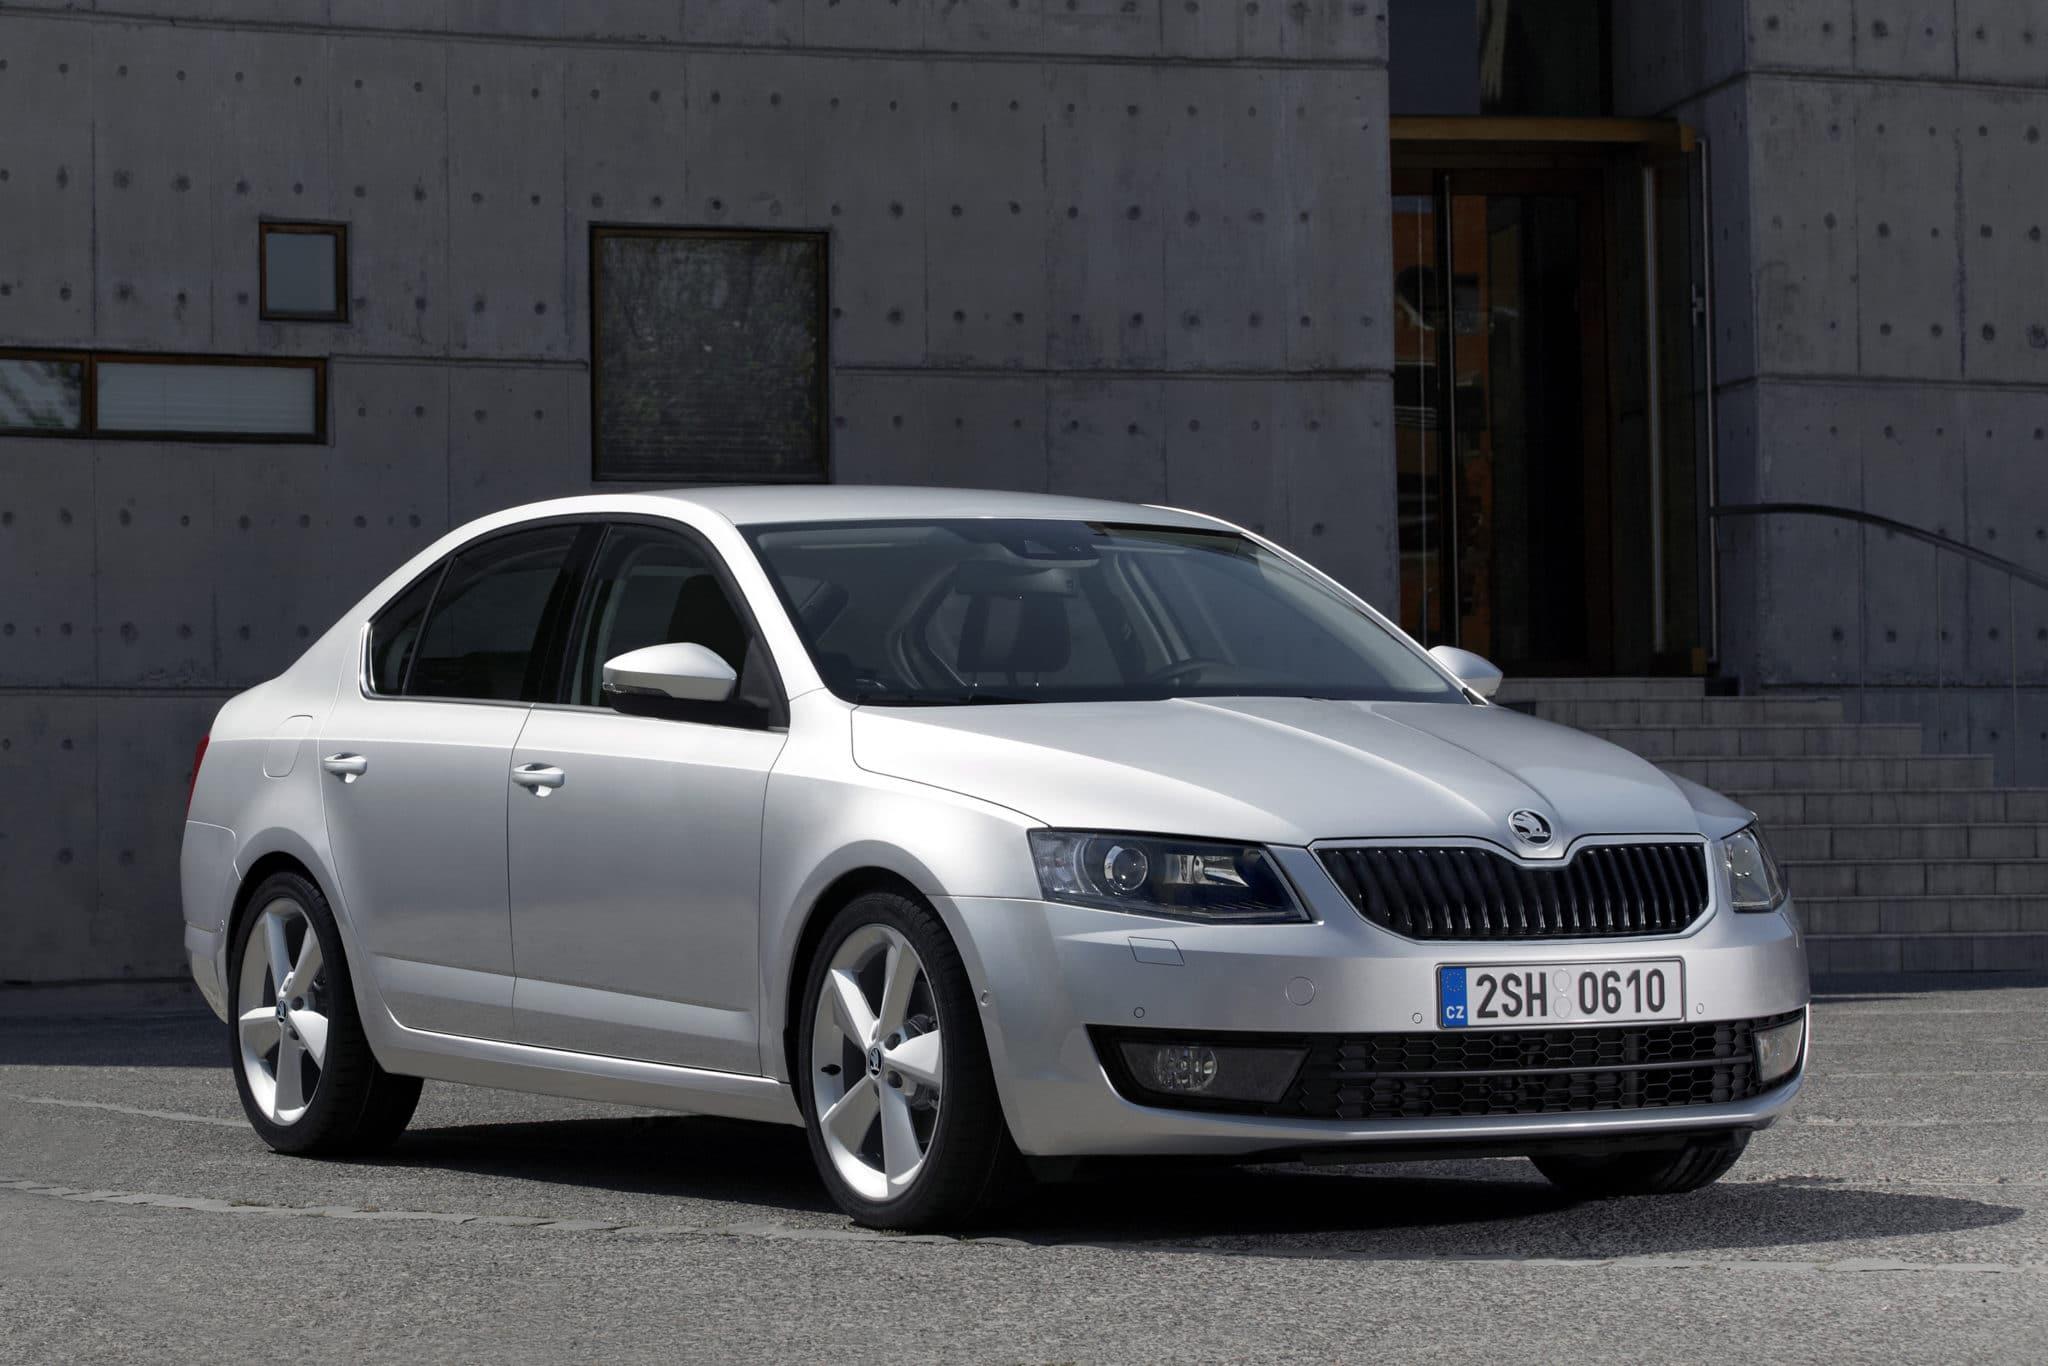 Nuova Škoda Octavia: porte aperte nelle concessionarie Škoda questo weekend